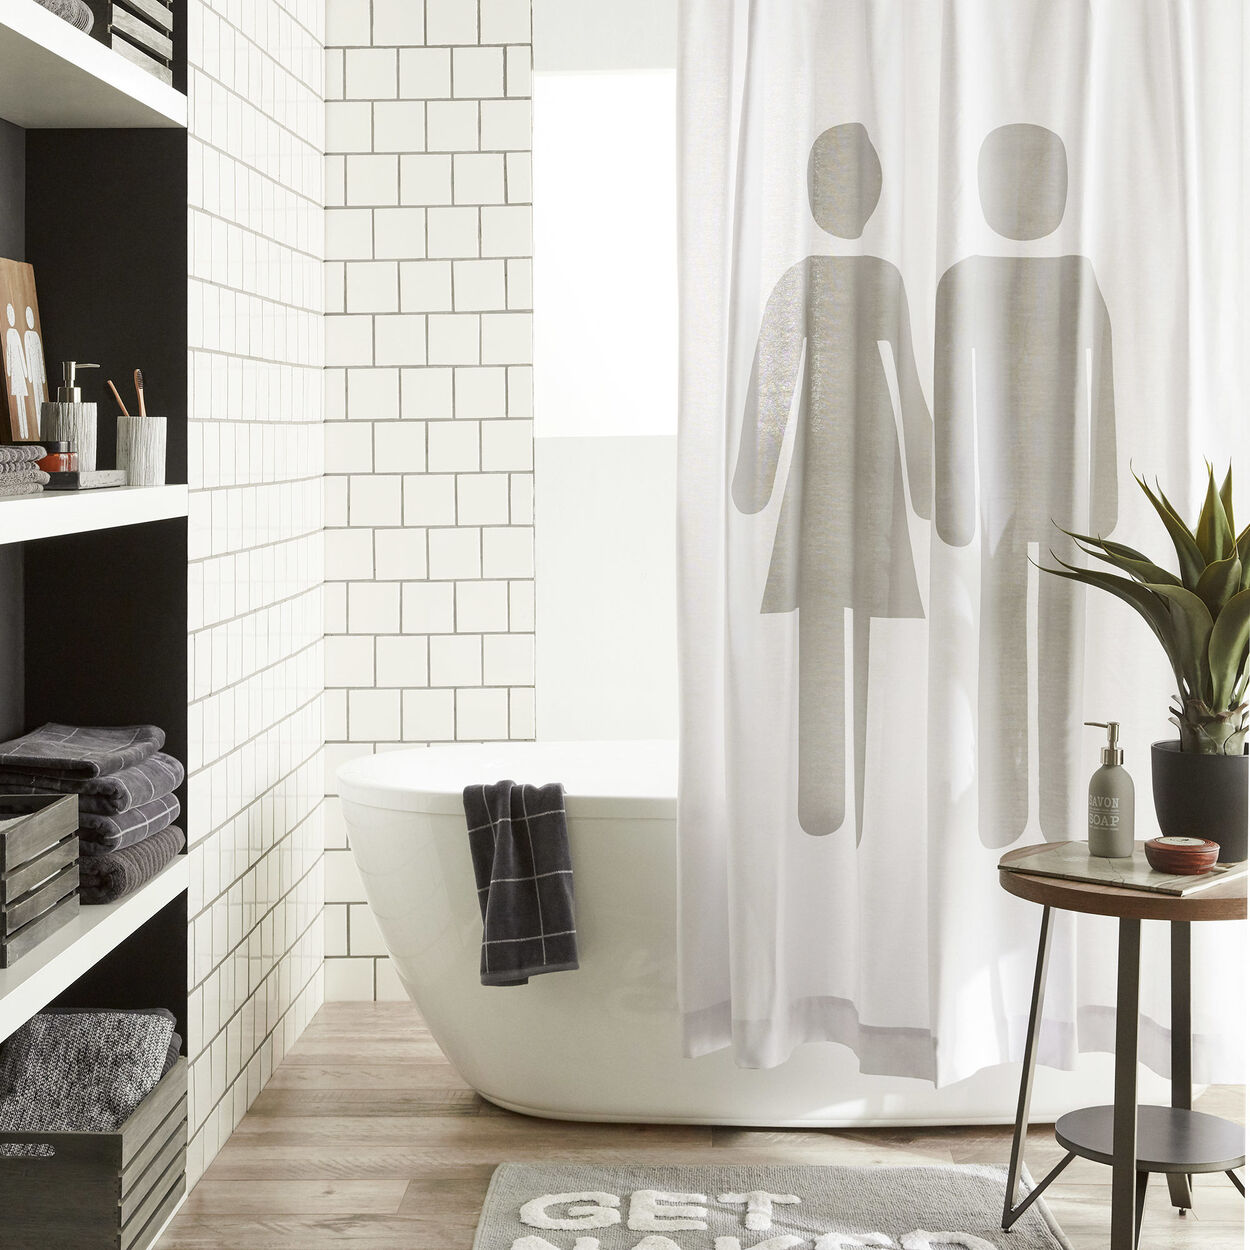 Man Woman Shower Curtain